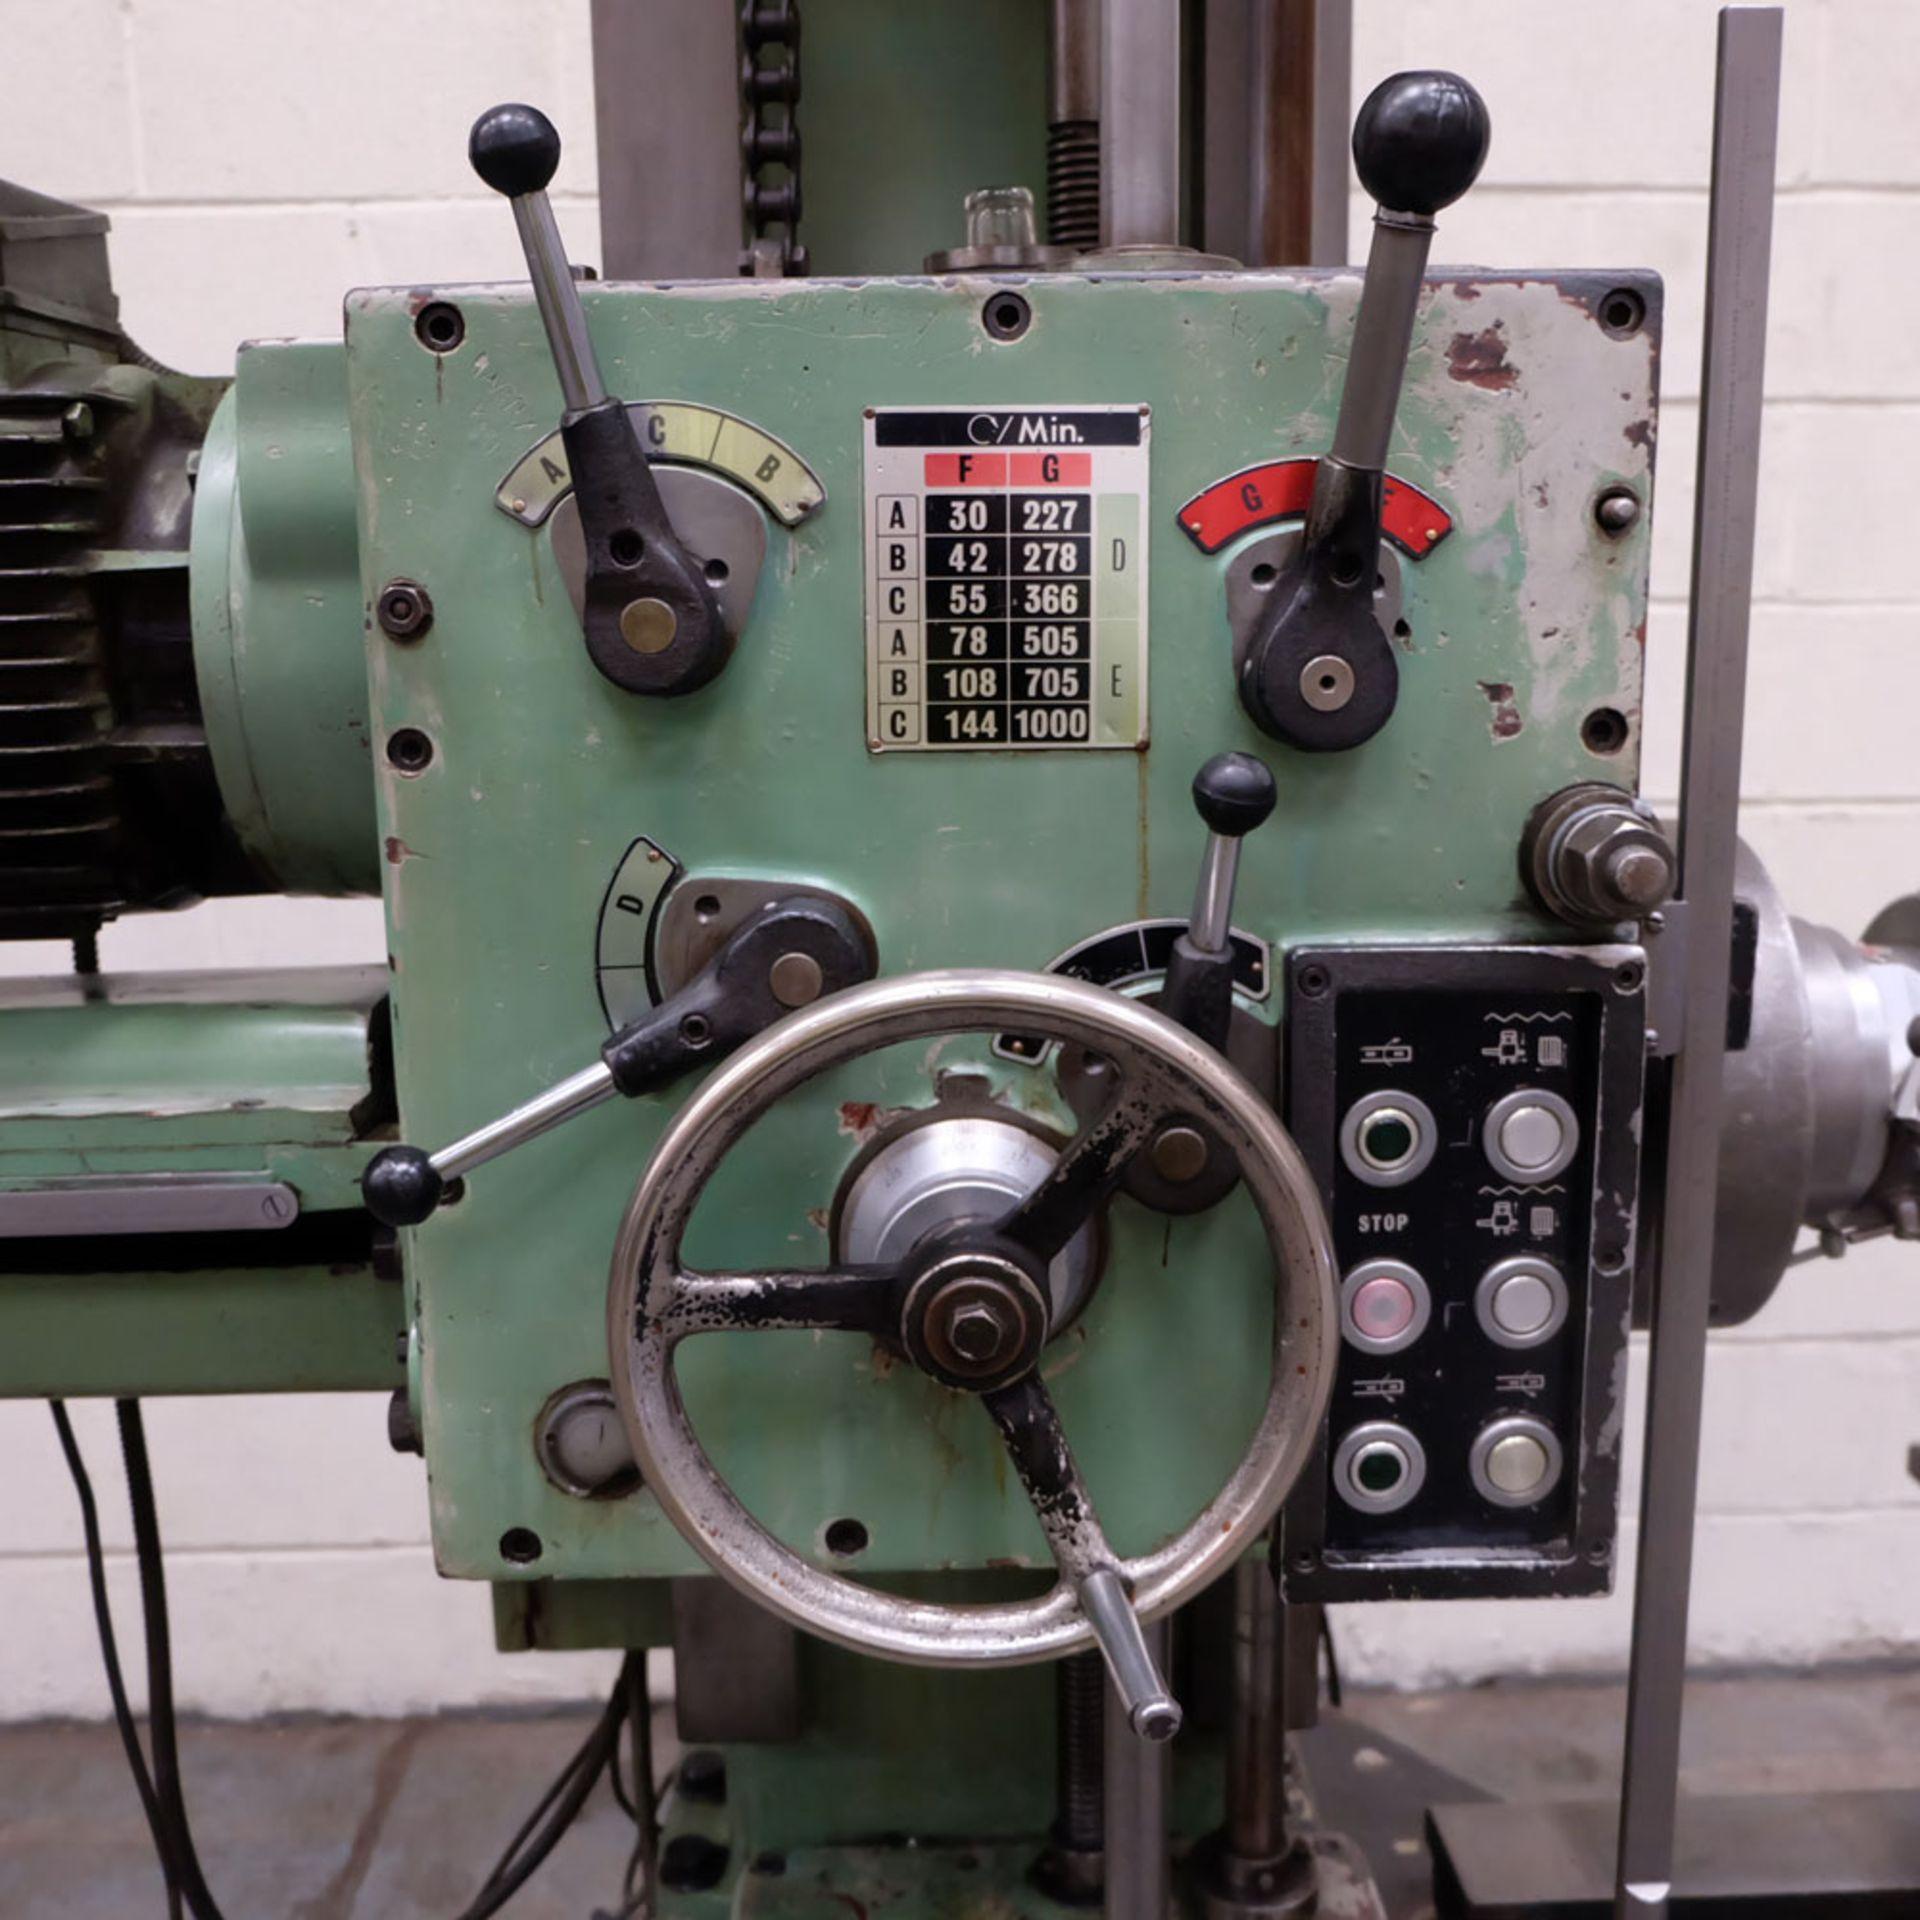 Juaristi Model MDR-55 Horizontal Boring Machine. Spindle Size: 55mm Dia. Spindle Bore: No.4 MT. - Image 7 of 14